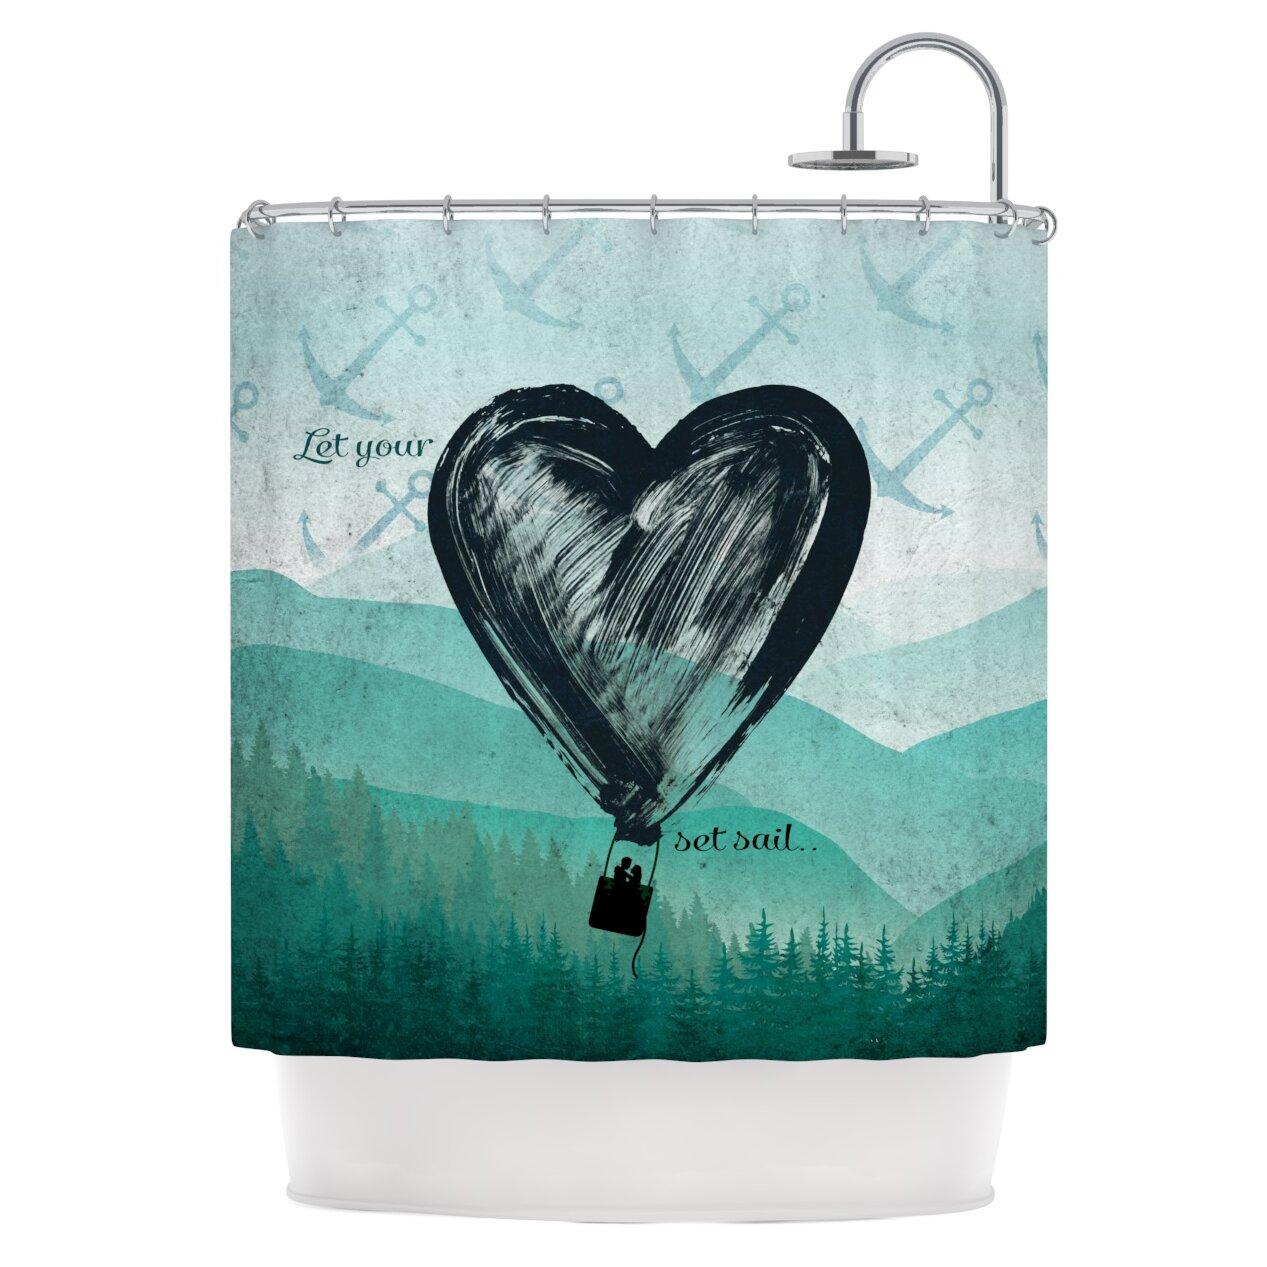 KESS InHouse Heart Set Sail Shower Curtain